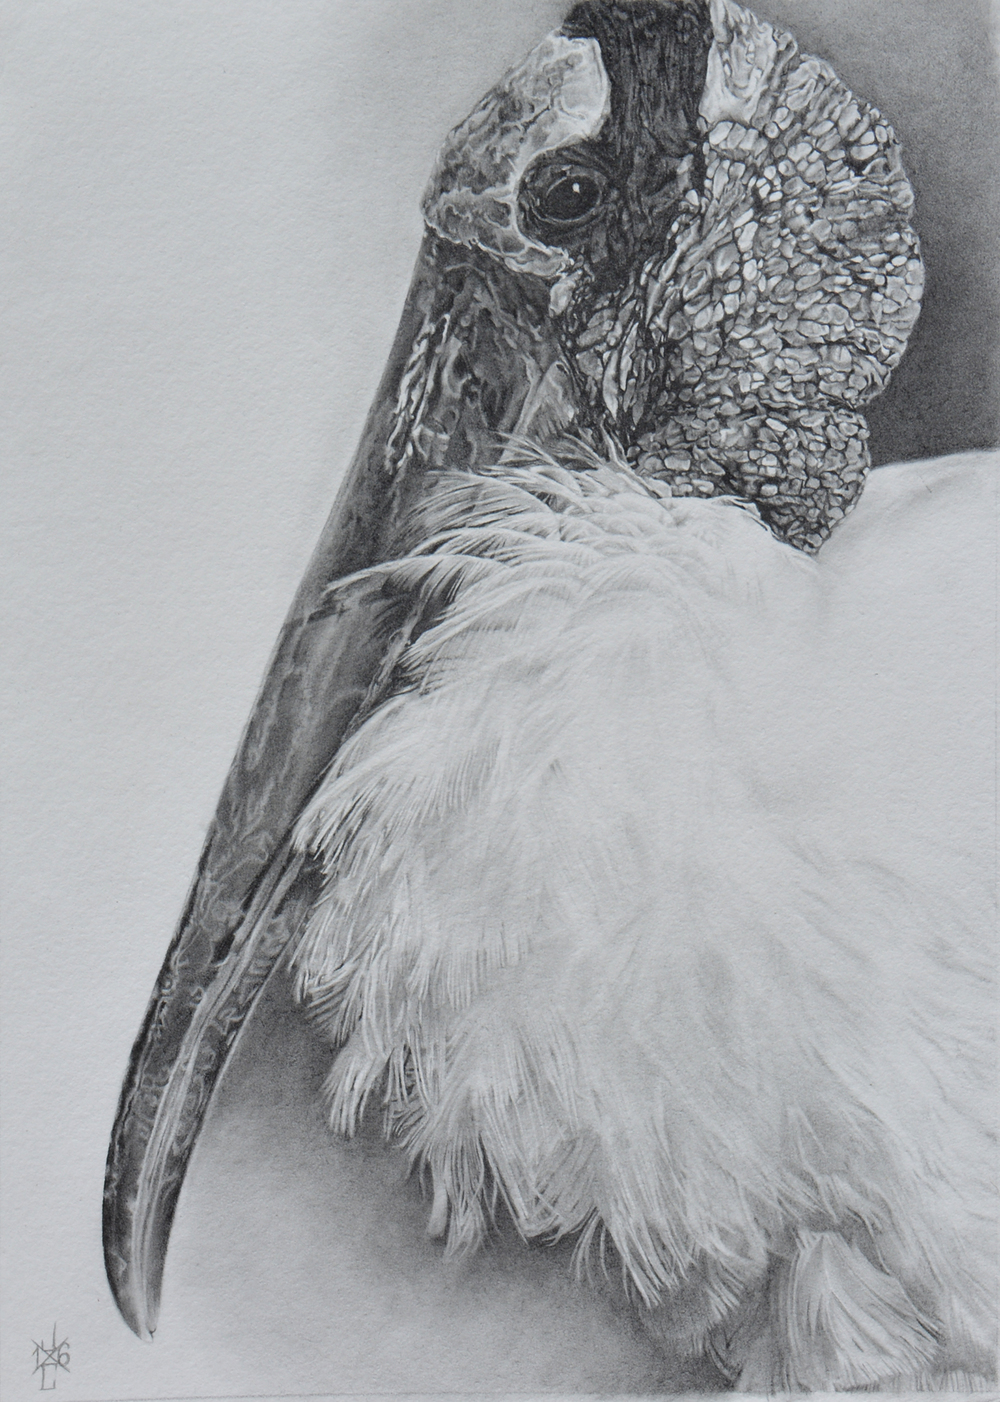 Wood Stork #1